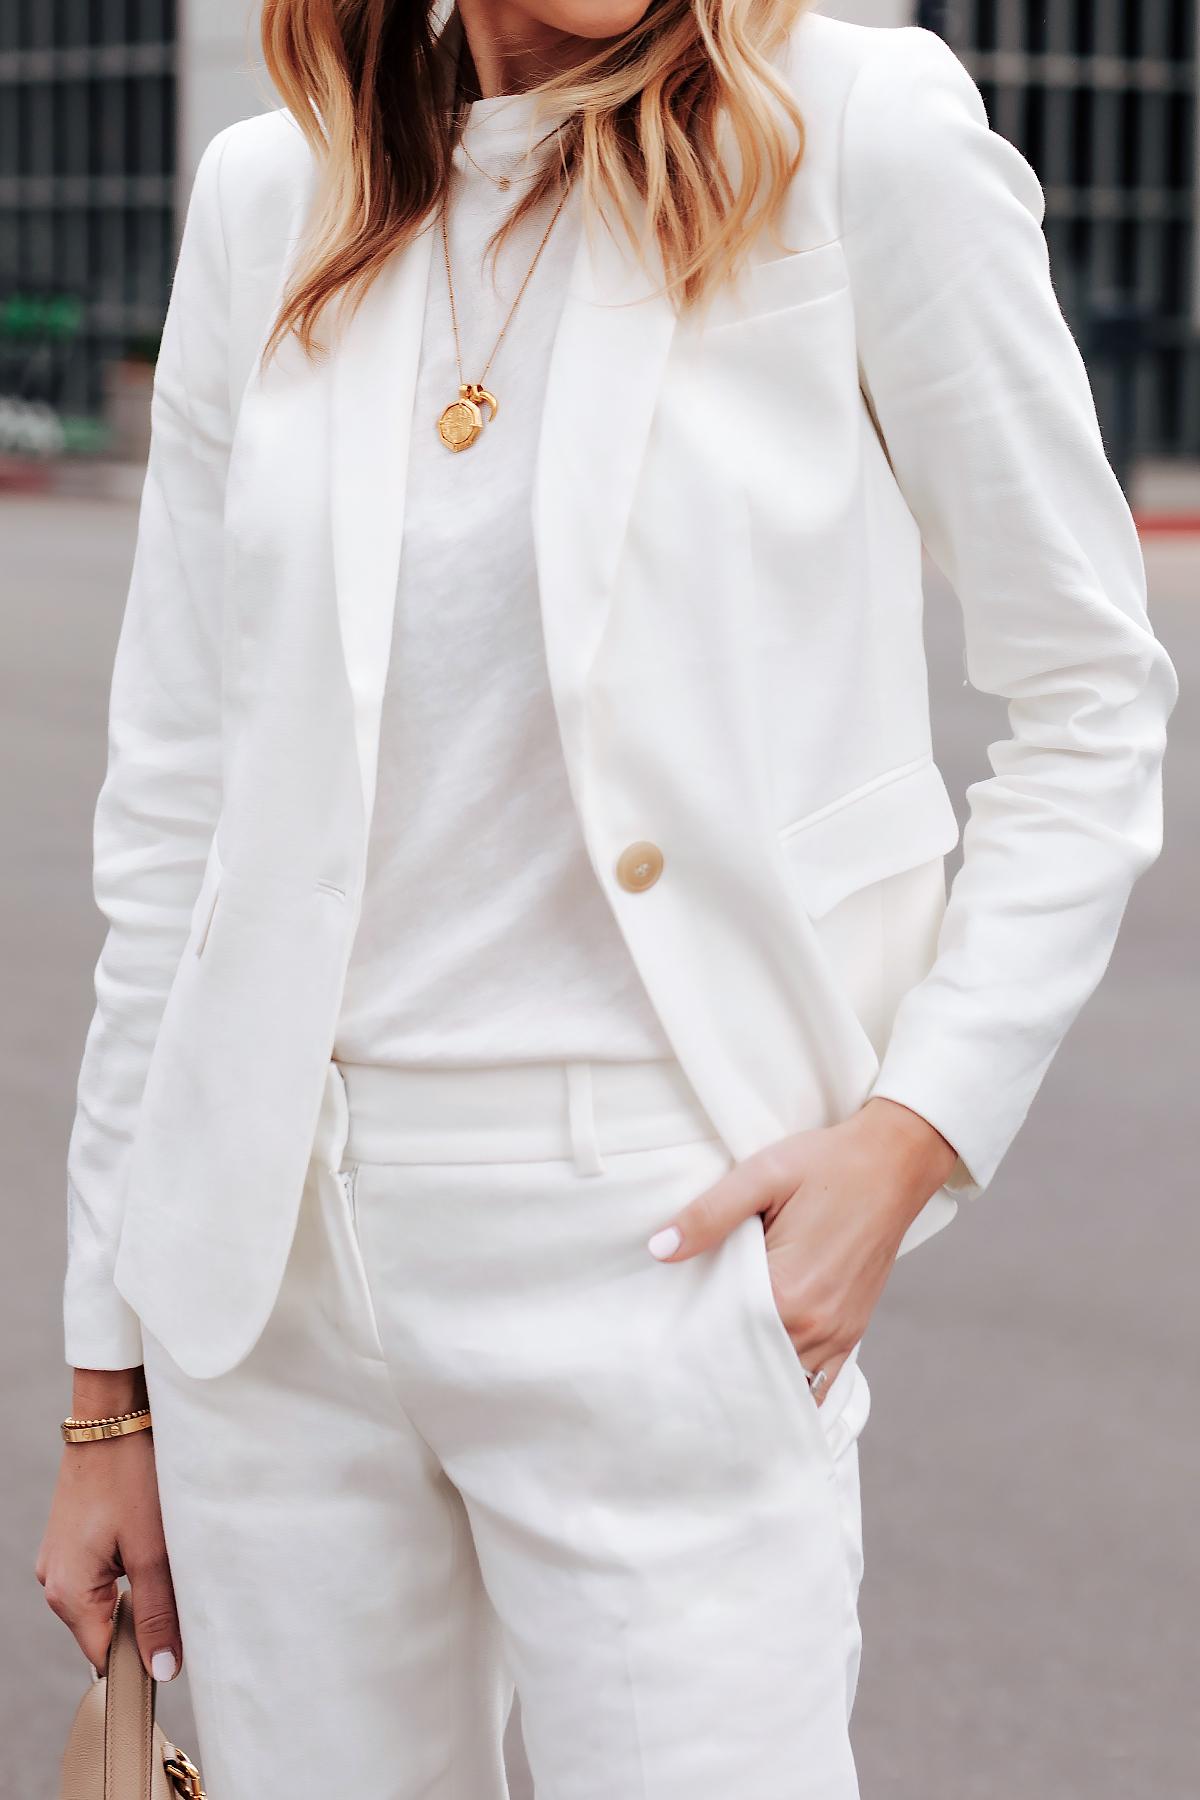 Fashion Jackson Wearing Ann Taylor White Blazer White Tshirt White Pants Gold Necklaces